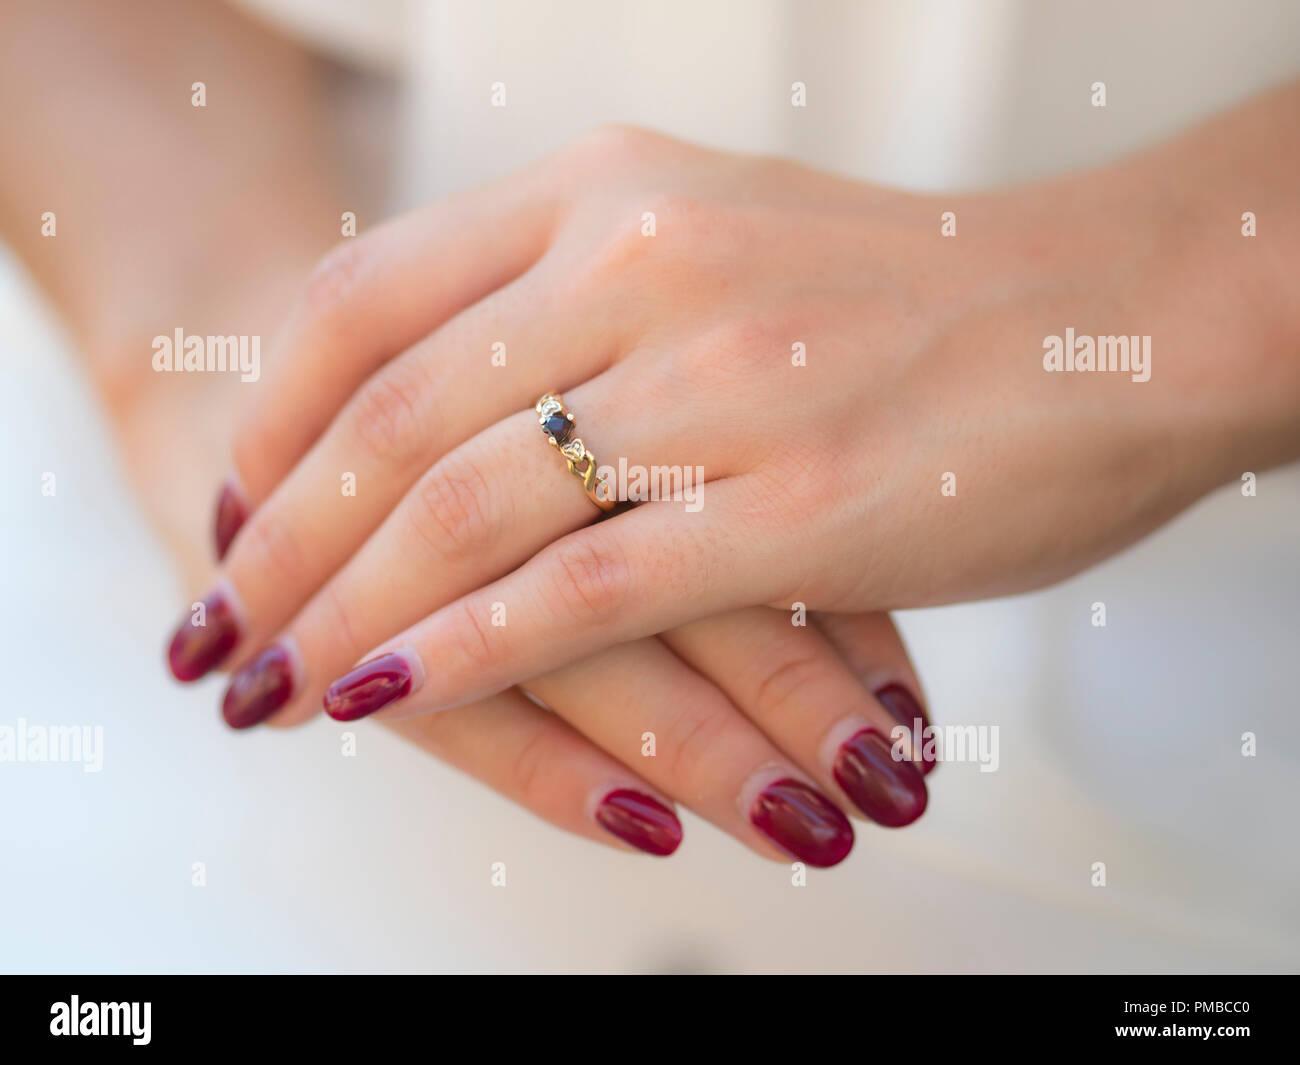 41c7fa3fbbb2 Betrothed Finger Imágenes De Stock   Betrothed Finger Fotos De Stock ...